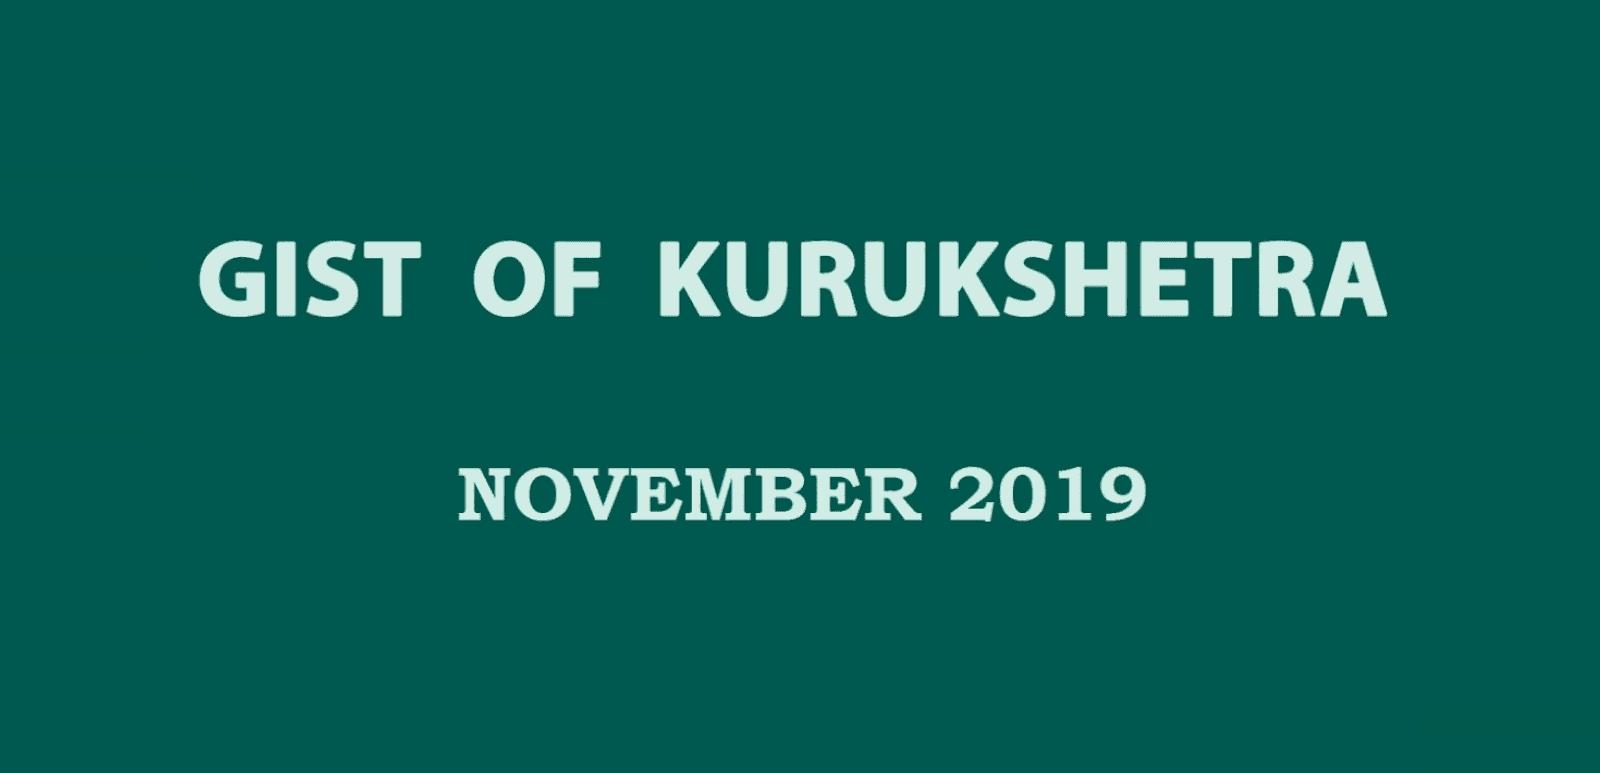 GIST of Kurukshetra November 2019 PDF